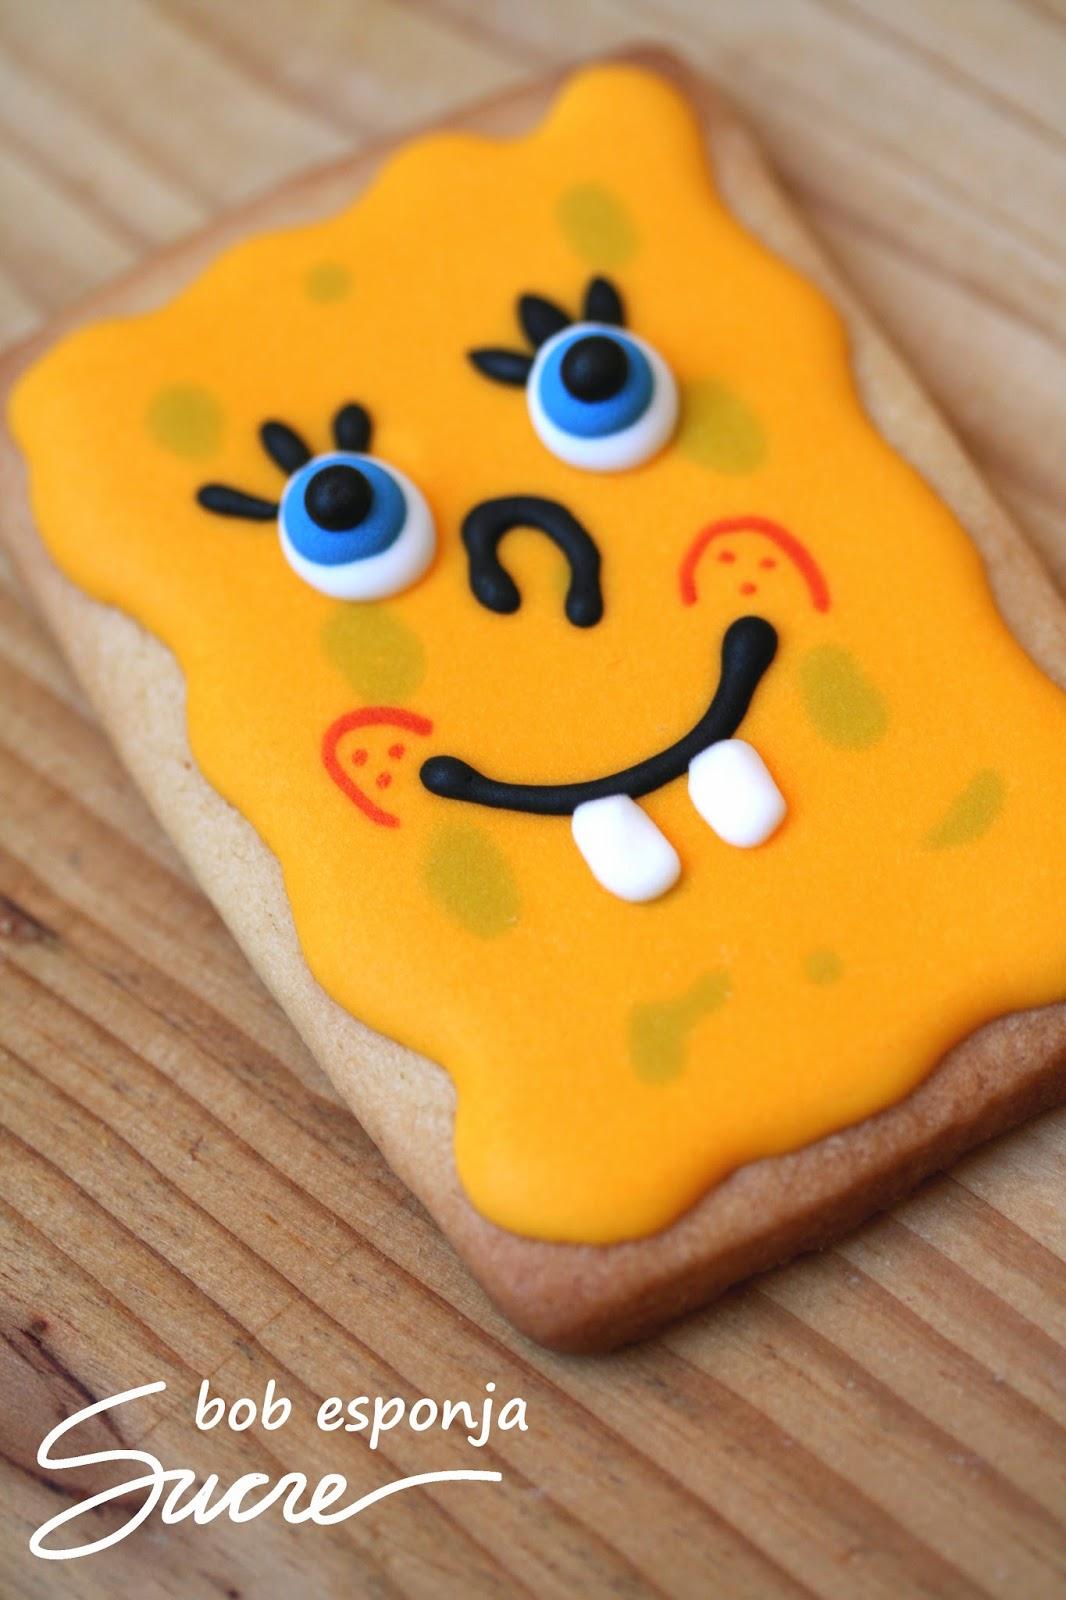 galetes decorades de Bob Esponja, dibuixos animats, galletas decoradas de Bob Esponja, dibujos animados